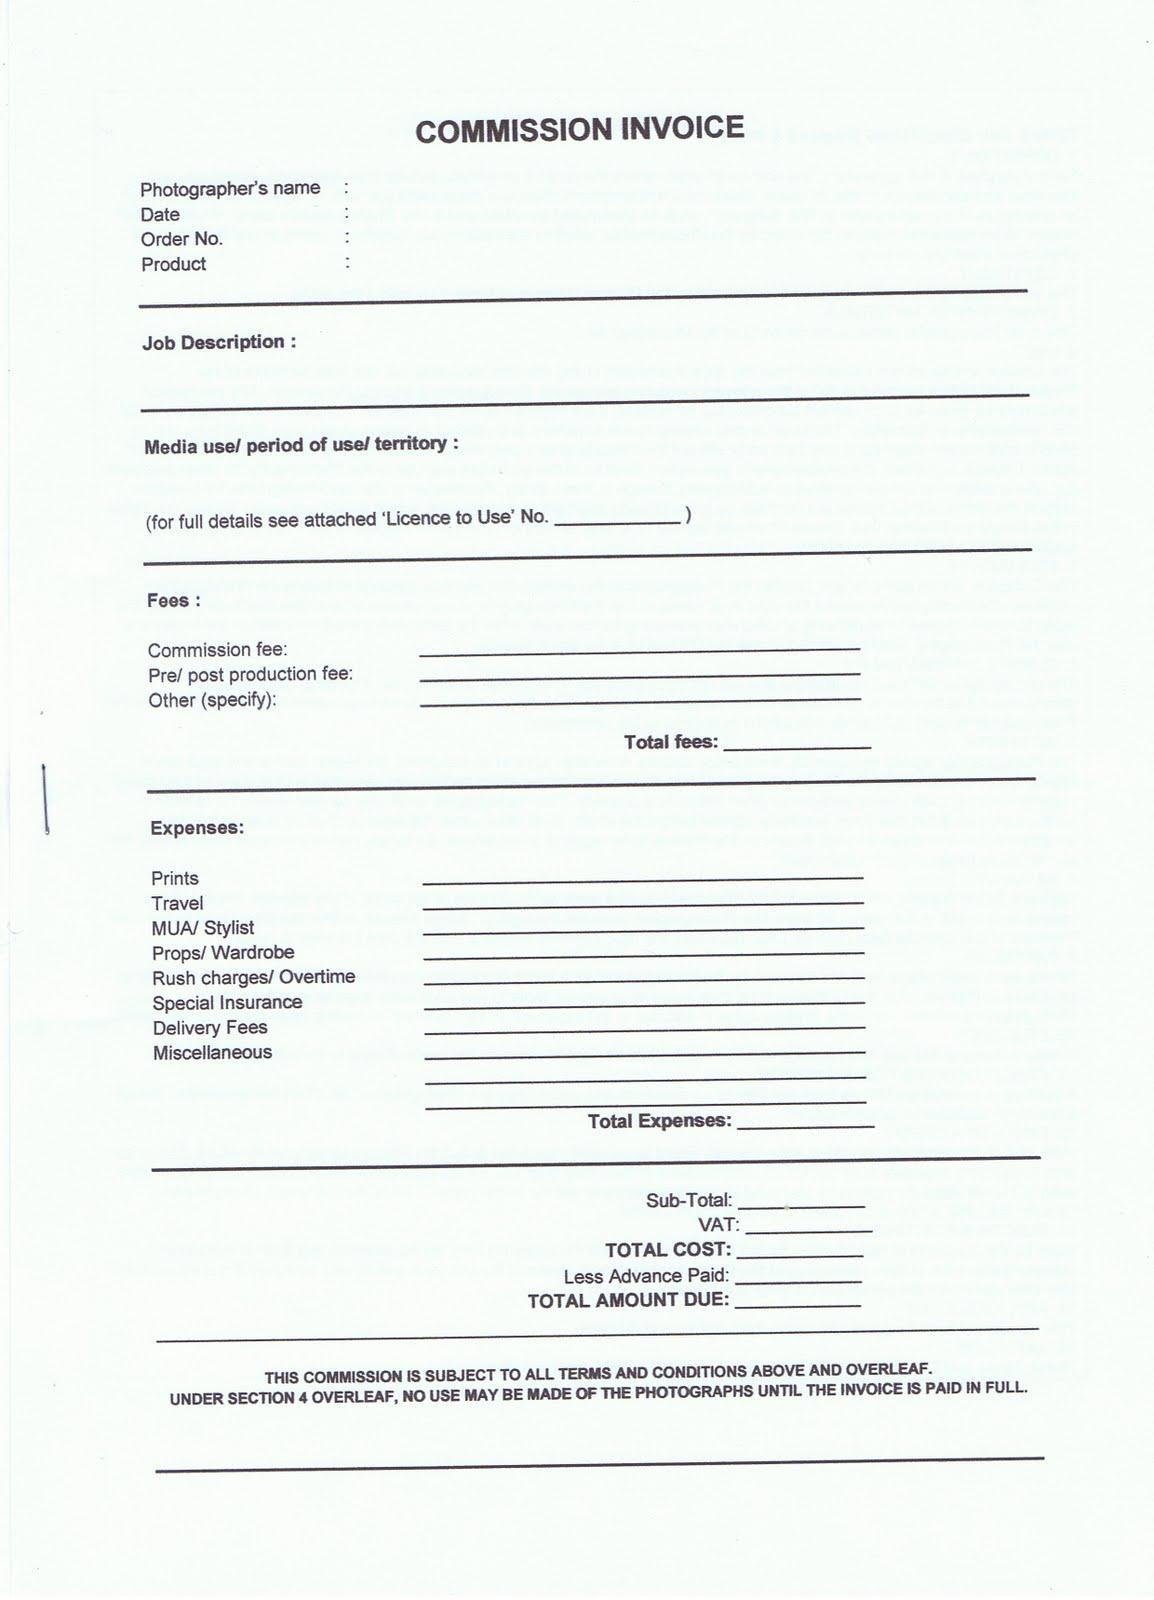 commission invoice form rough draft nikita